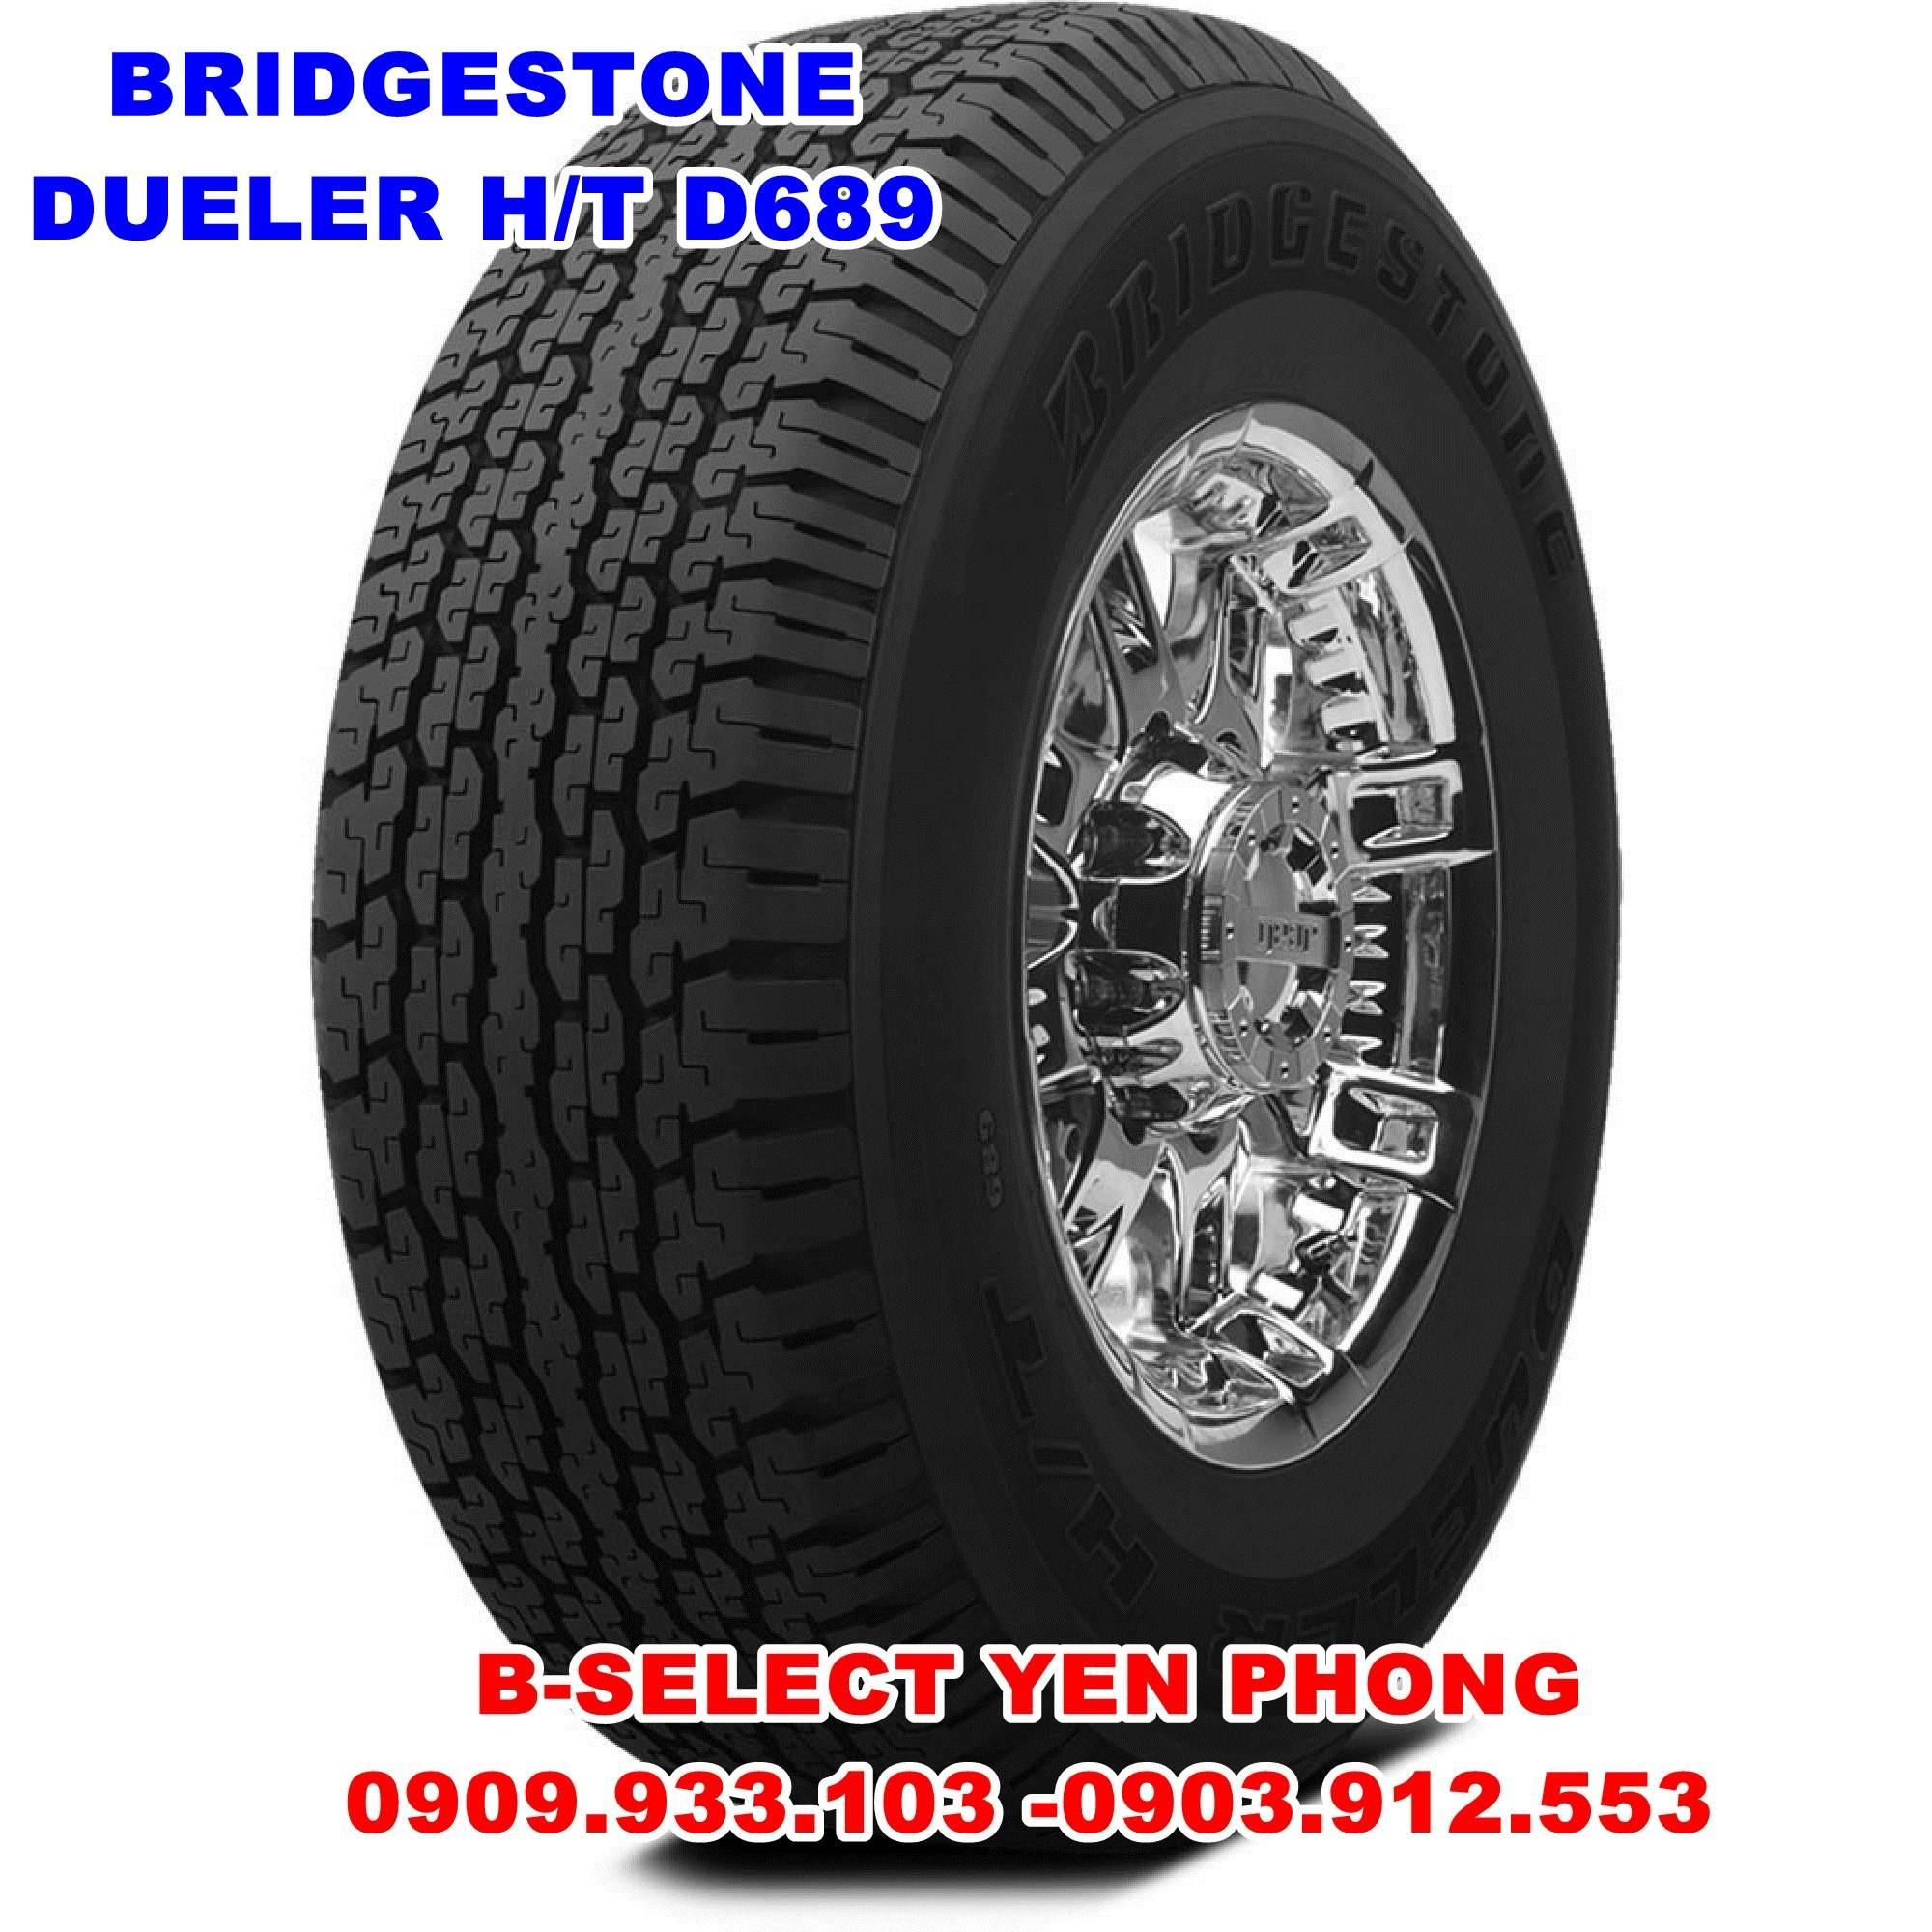 Lốp Xe Du Lịch Bridgestone Dueler 235/80R16 D689